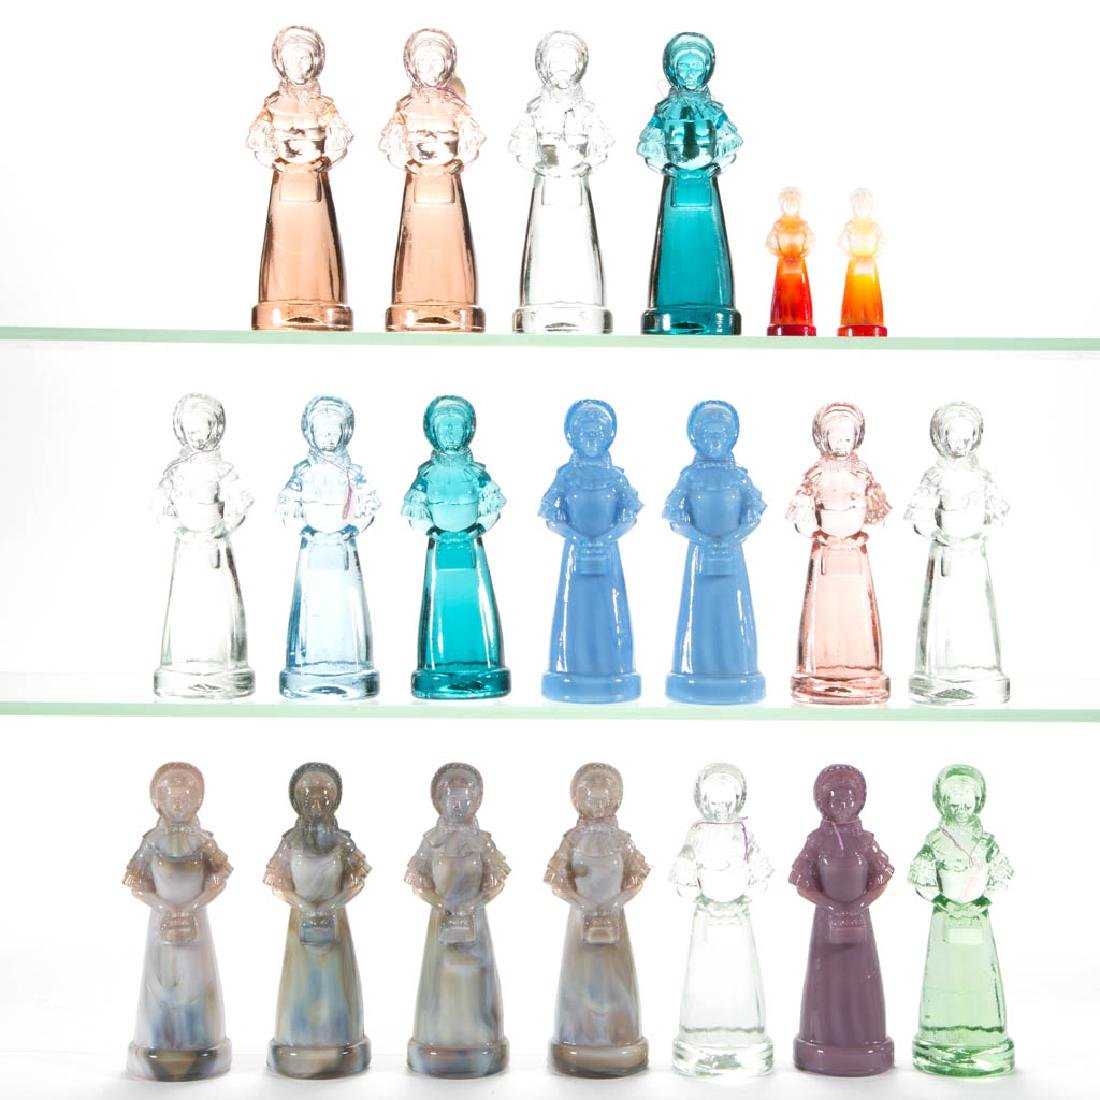 DEGENHART GLASS PRISCILLA / COLONIAL LADY FIGURES, LOT